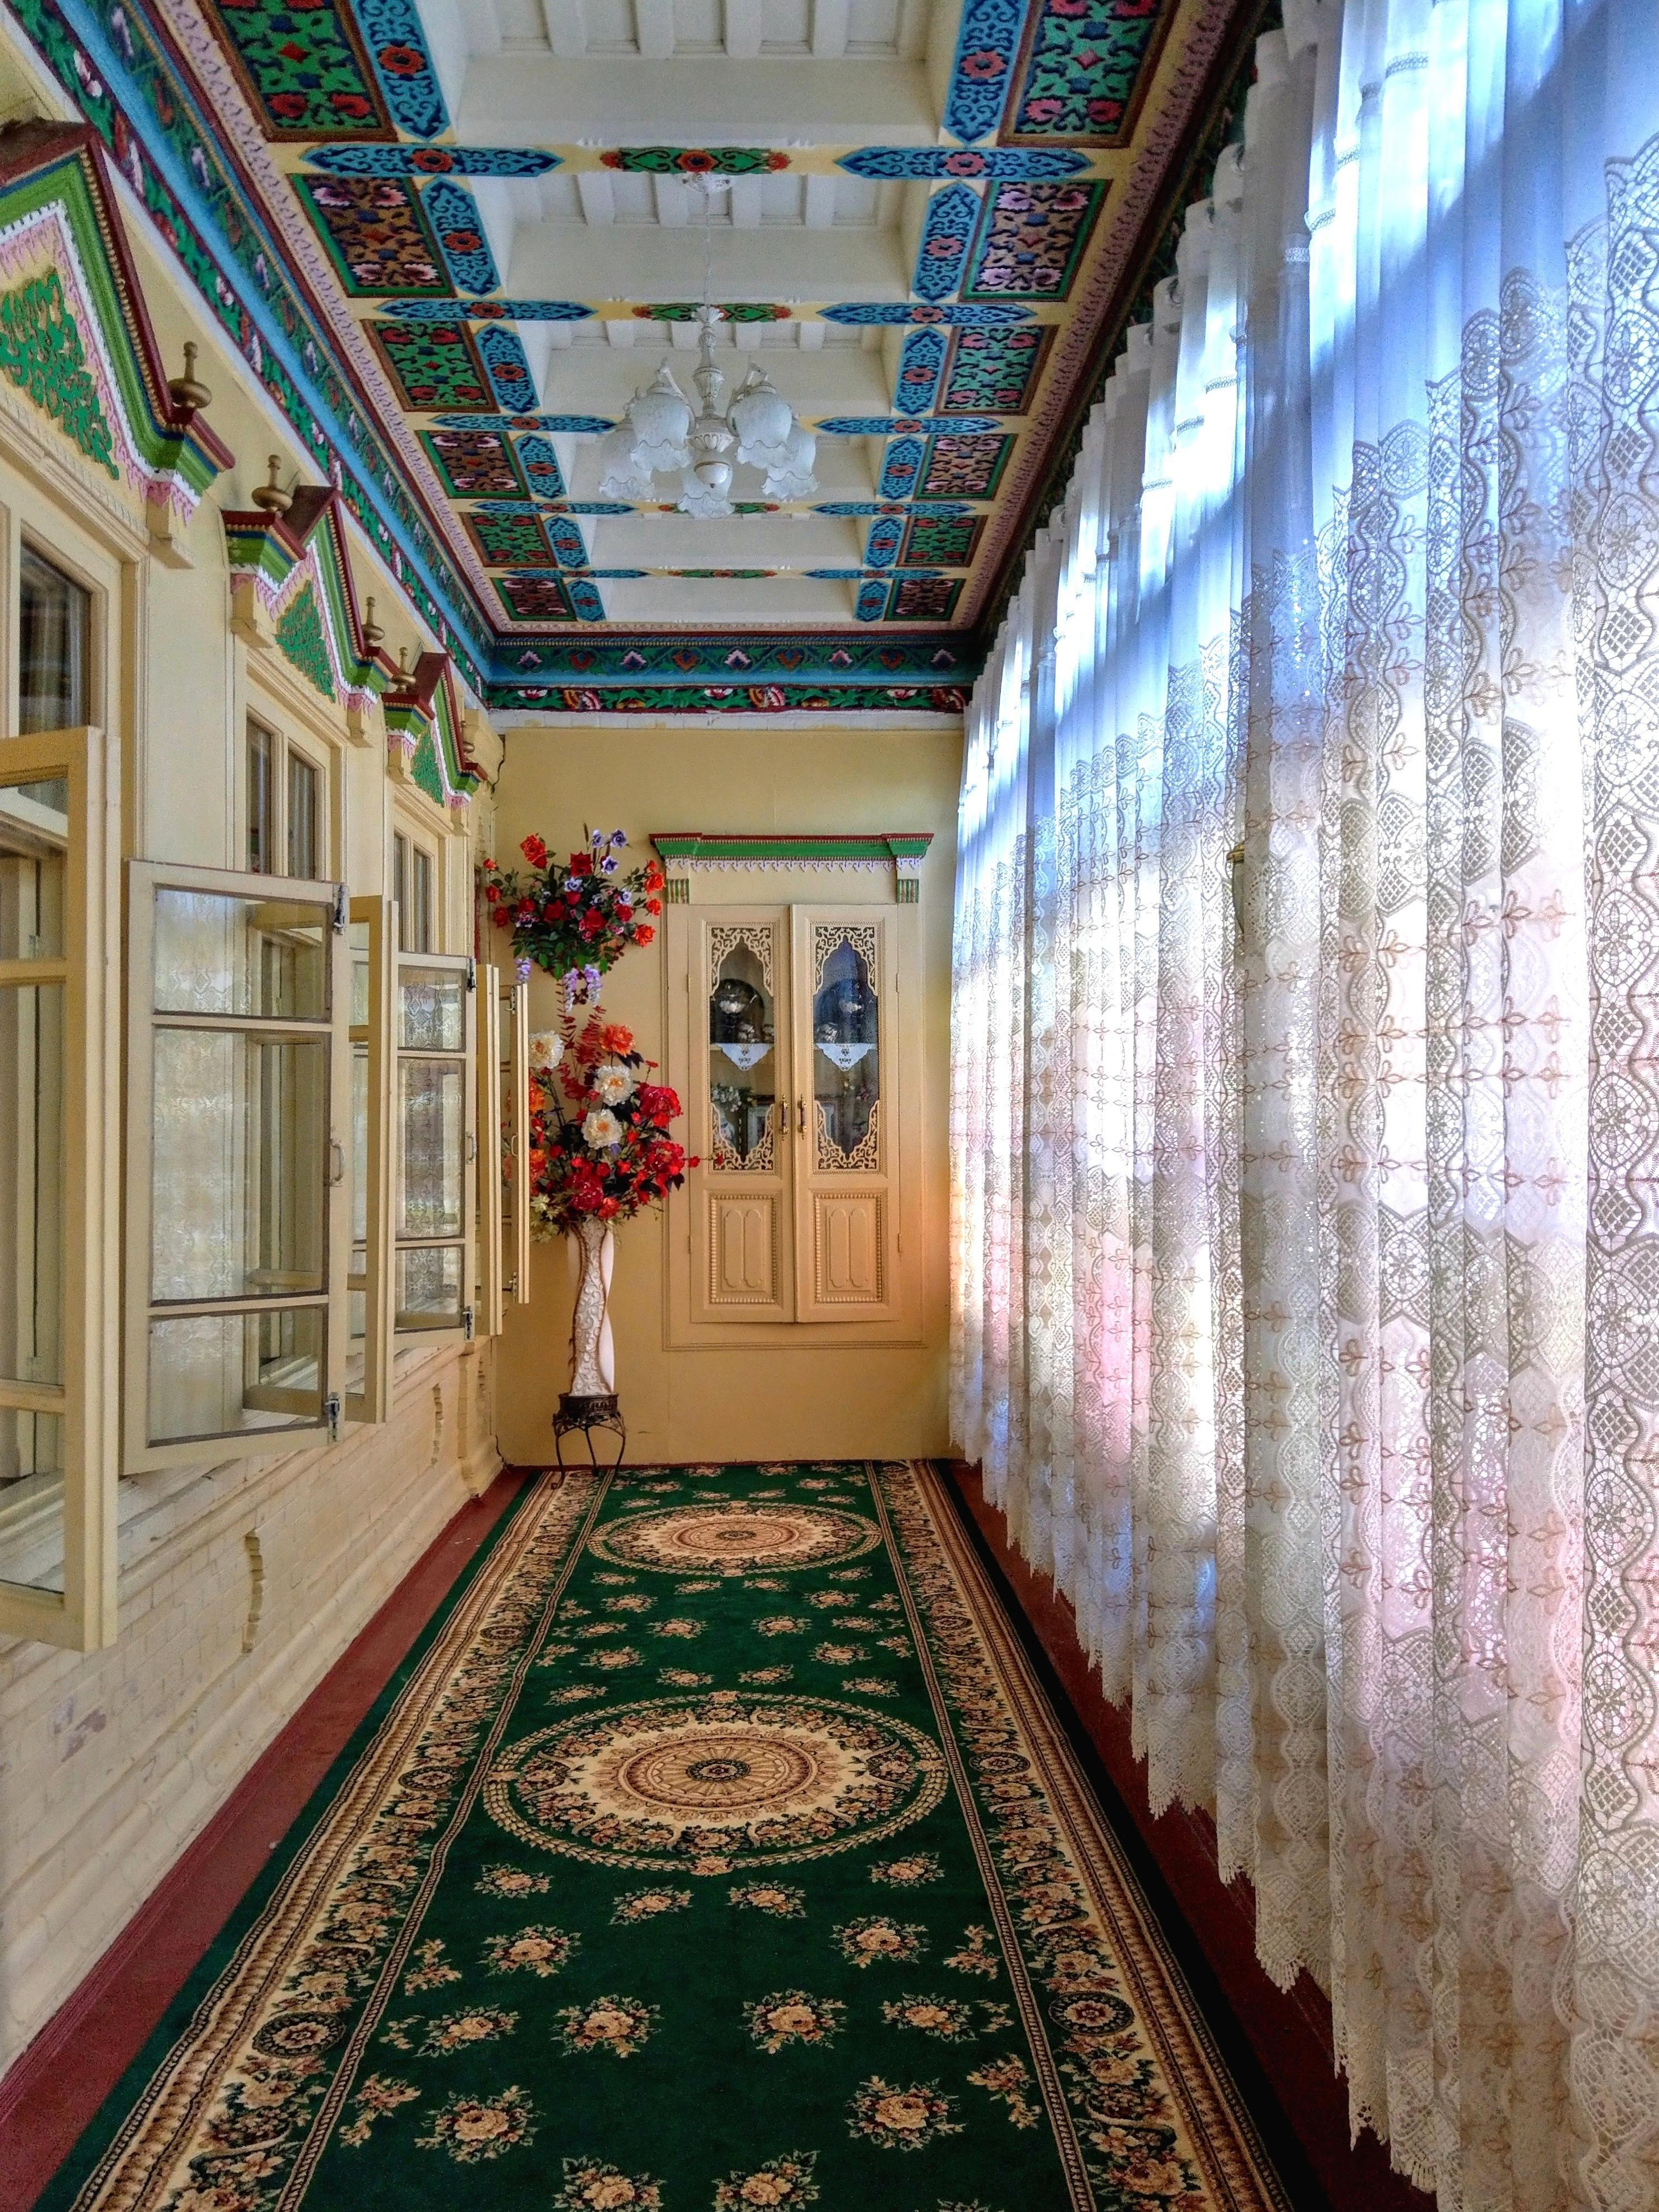 Corridor In An Uyghur House In Xinjiang China 2987 3983 Oc Check Out Desigedeco Interior Design Principles Creative Home Decor Interior Design Inspiration